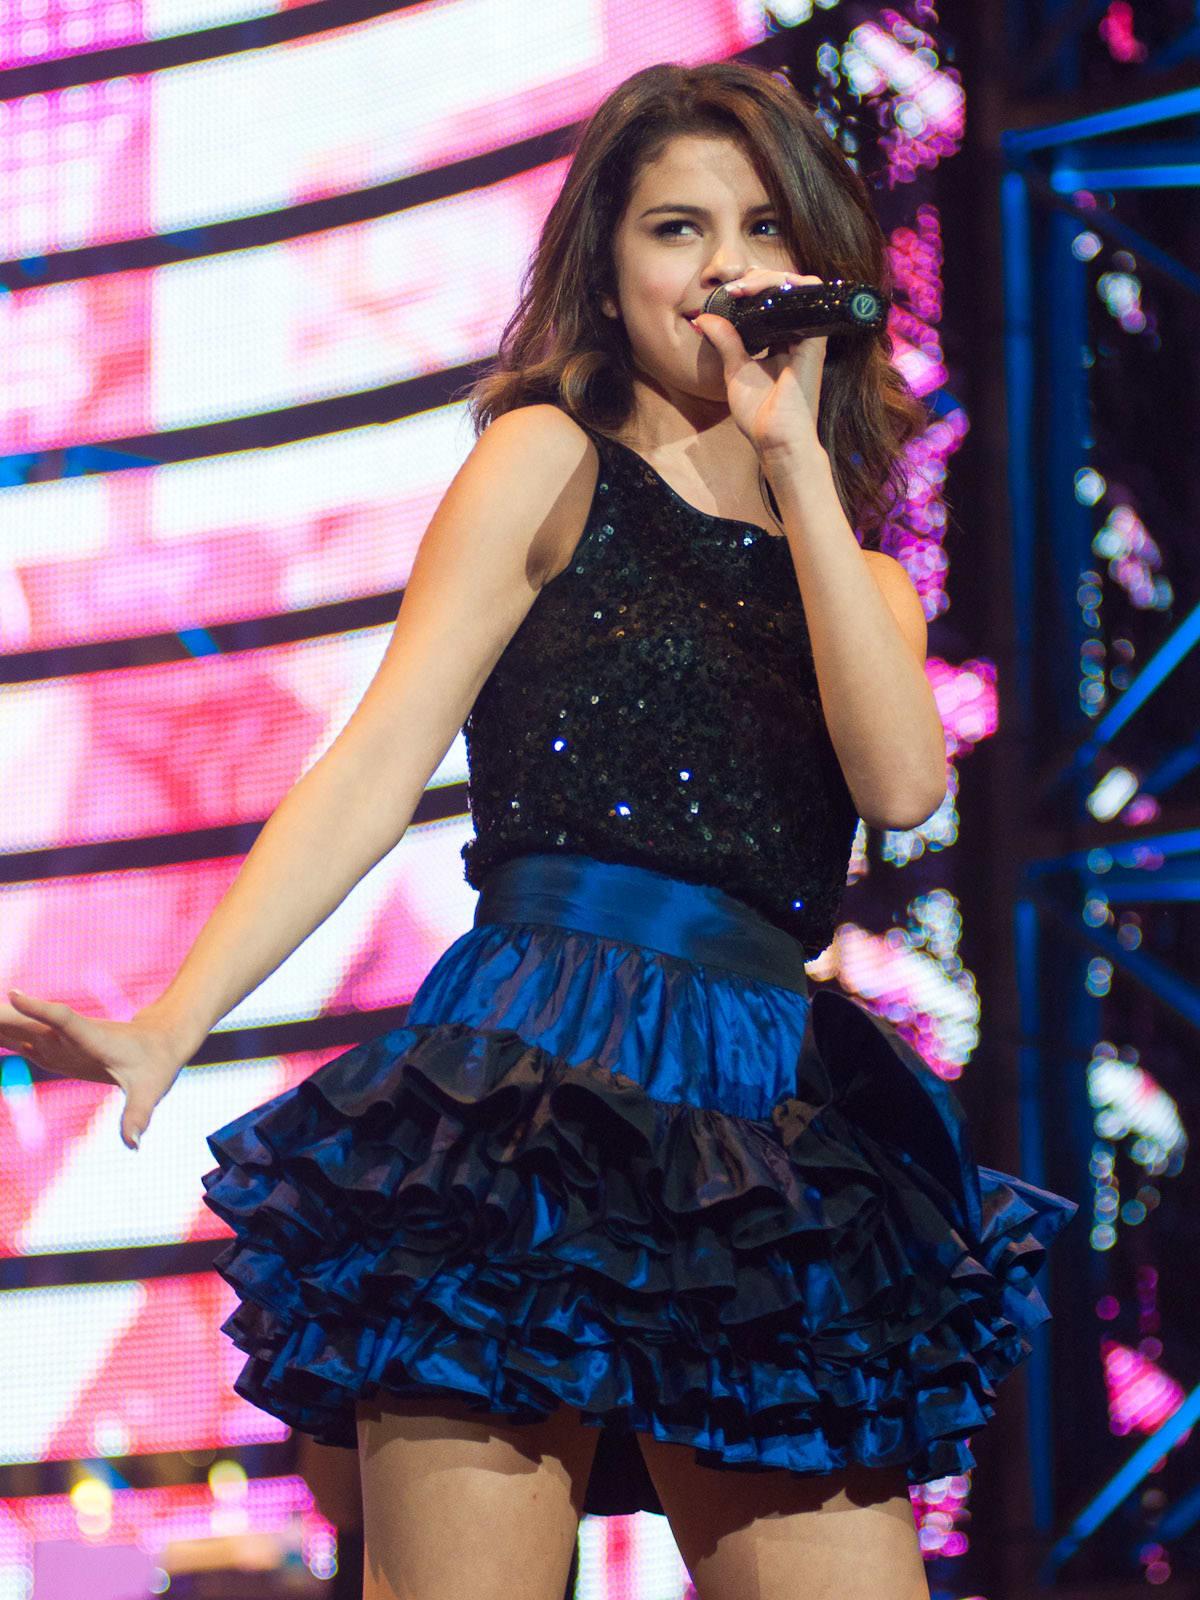 News_Rodeo_March 2011_Selena Gomez